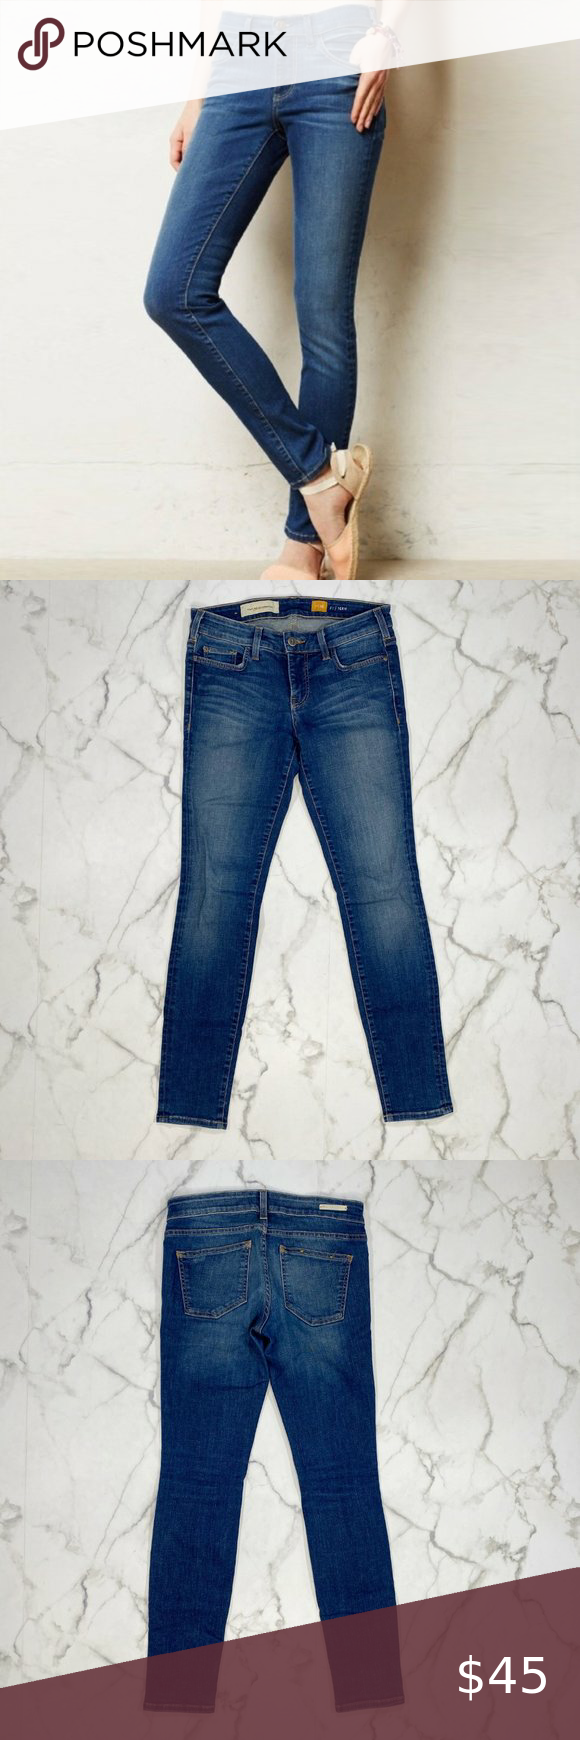 Anthropologie Pilcro Serif Skinny Jeans 28